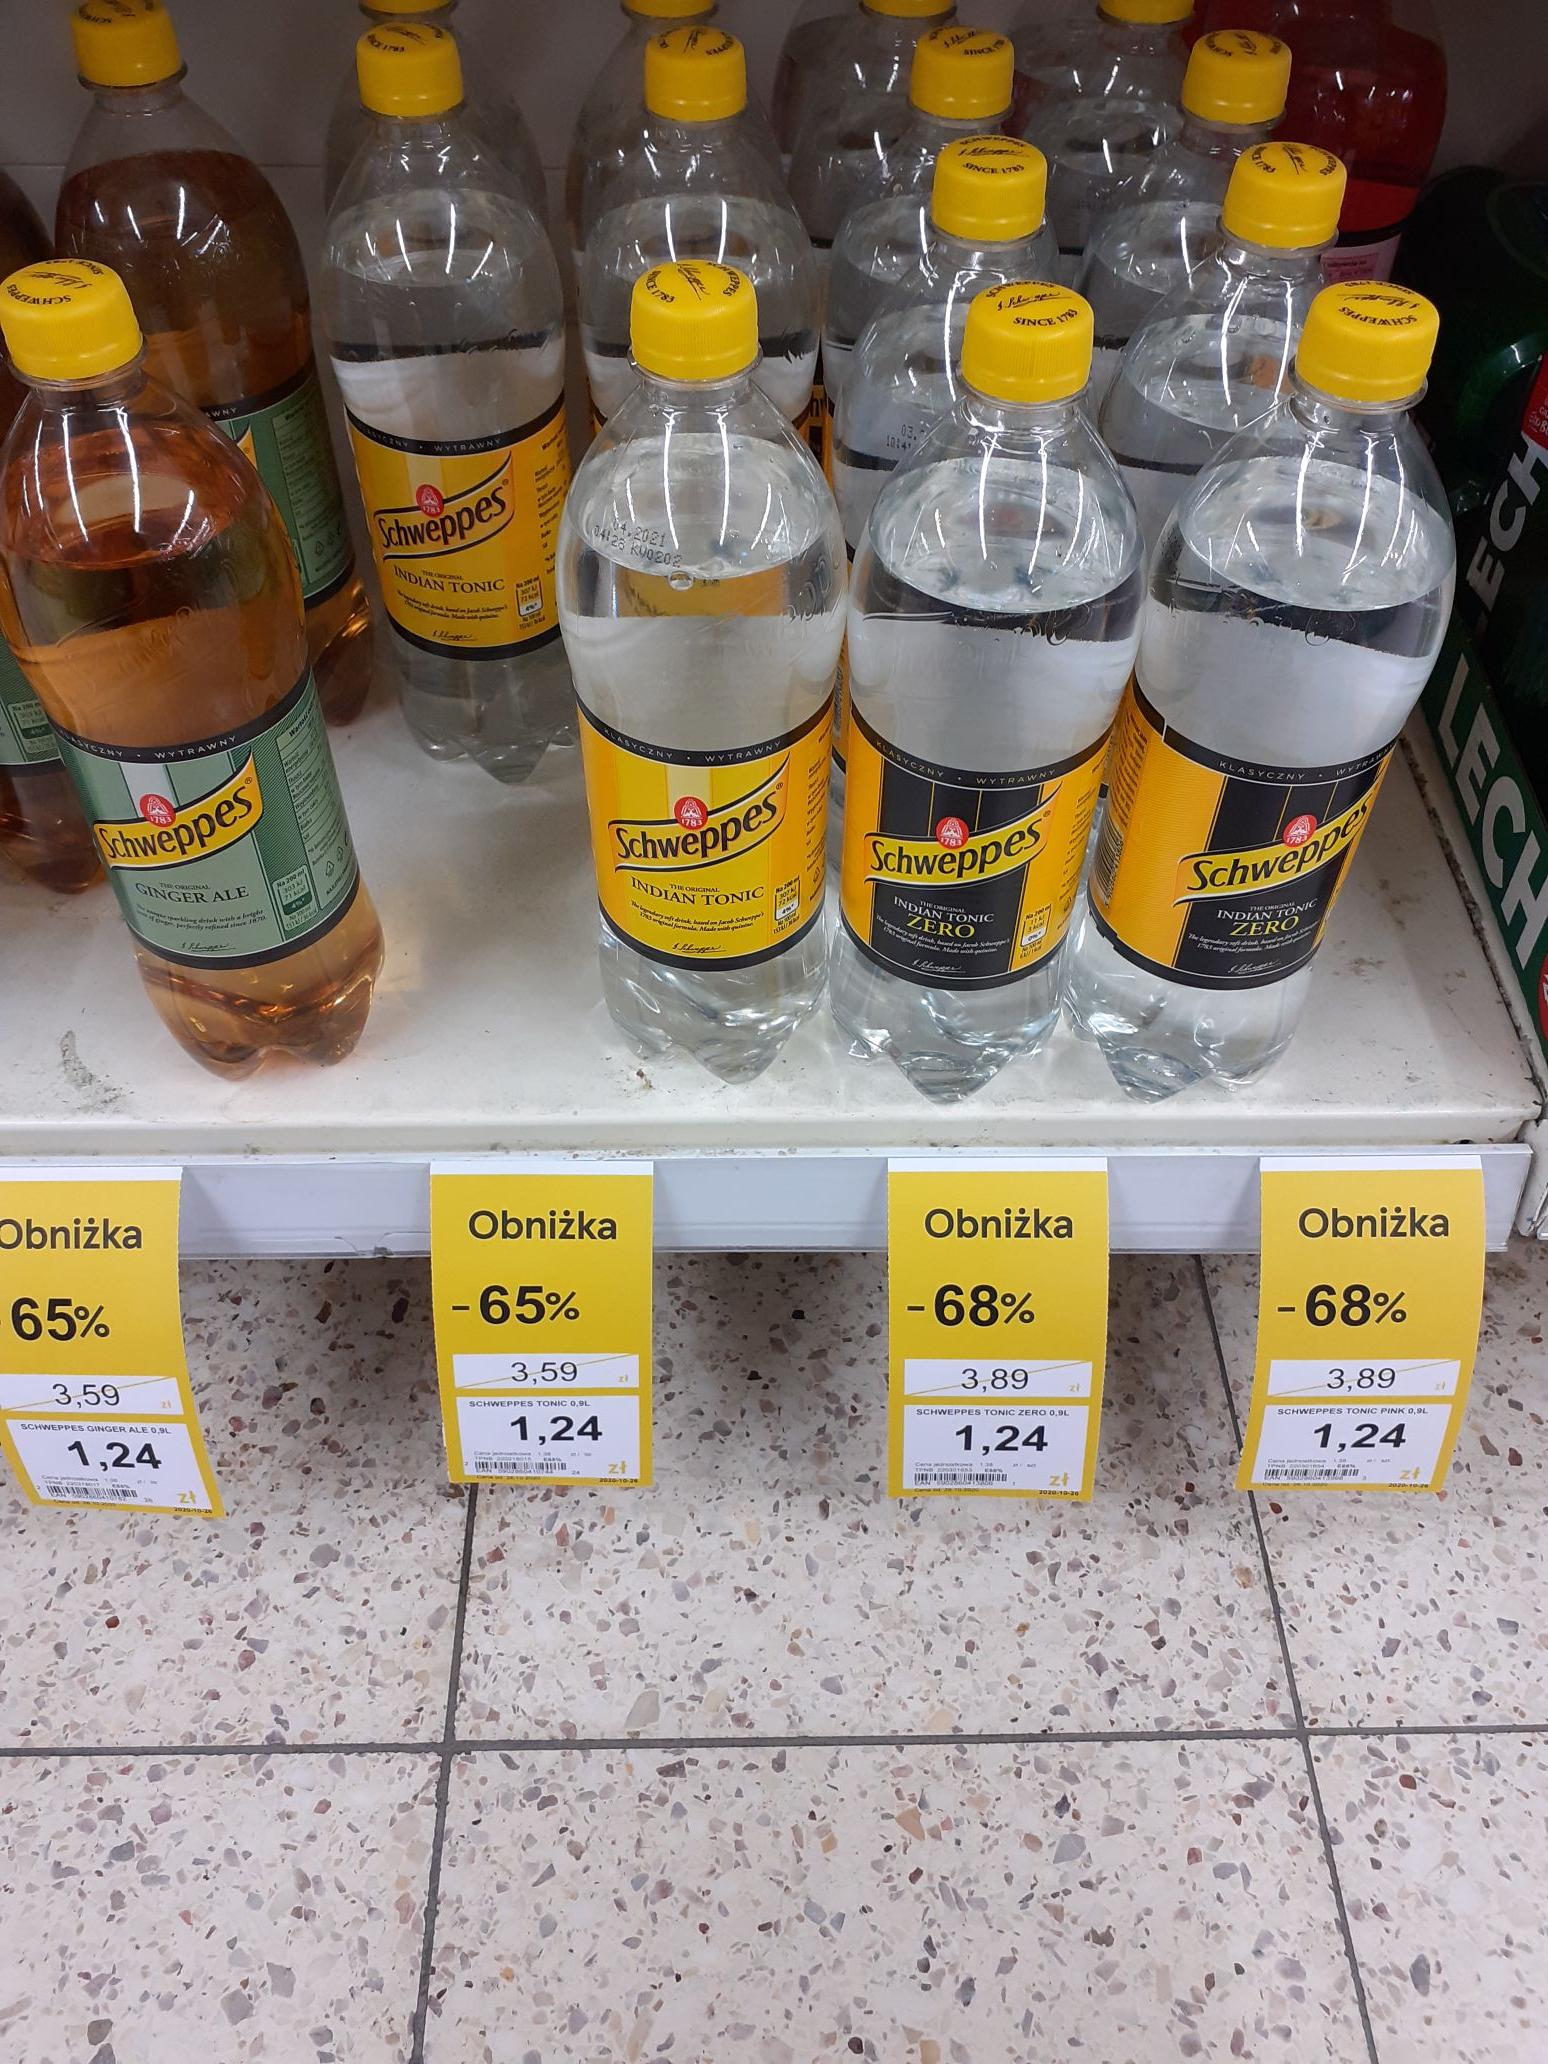 Schweppes 0,9l -68% tesco (gostynin)